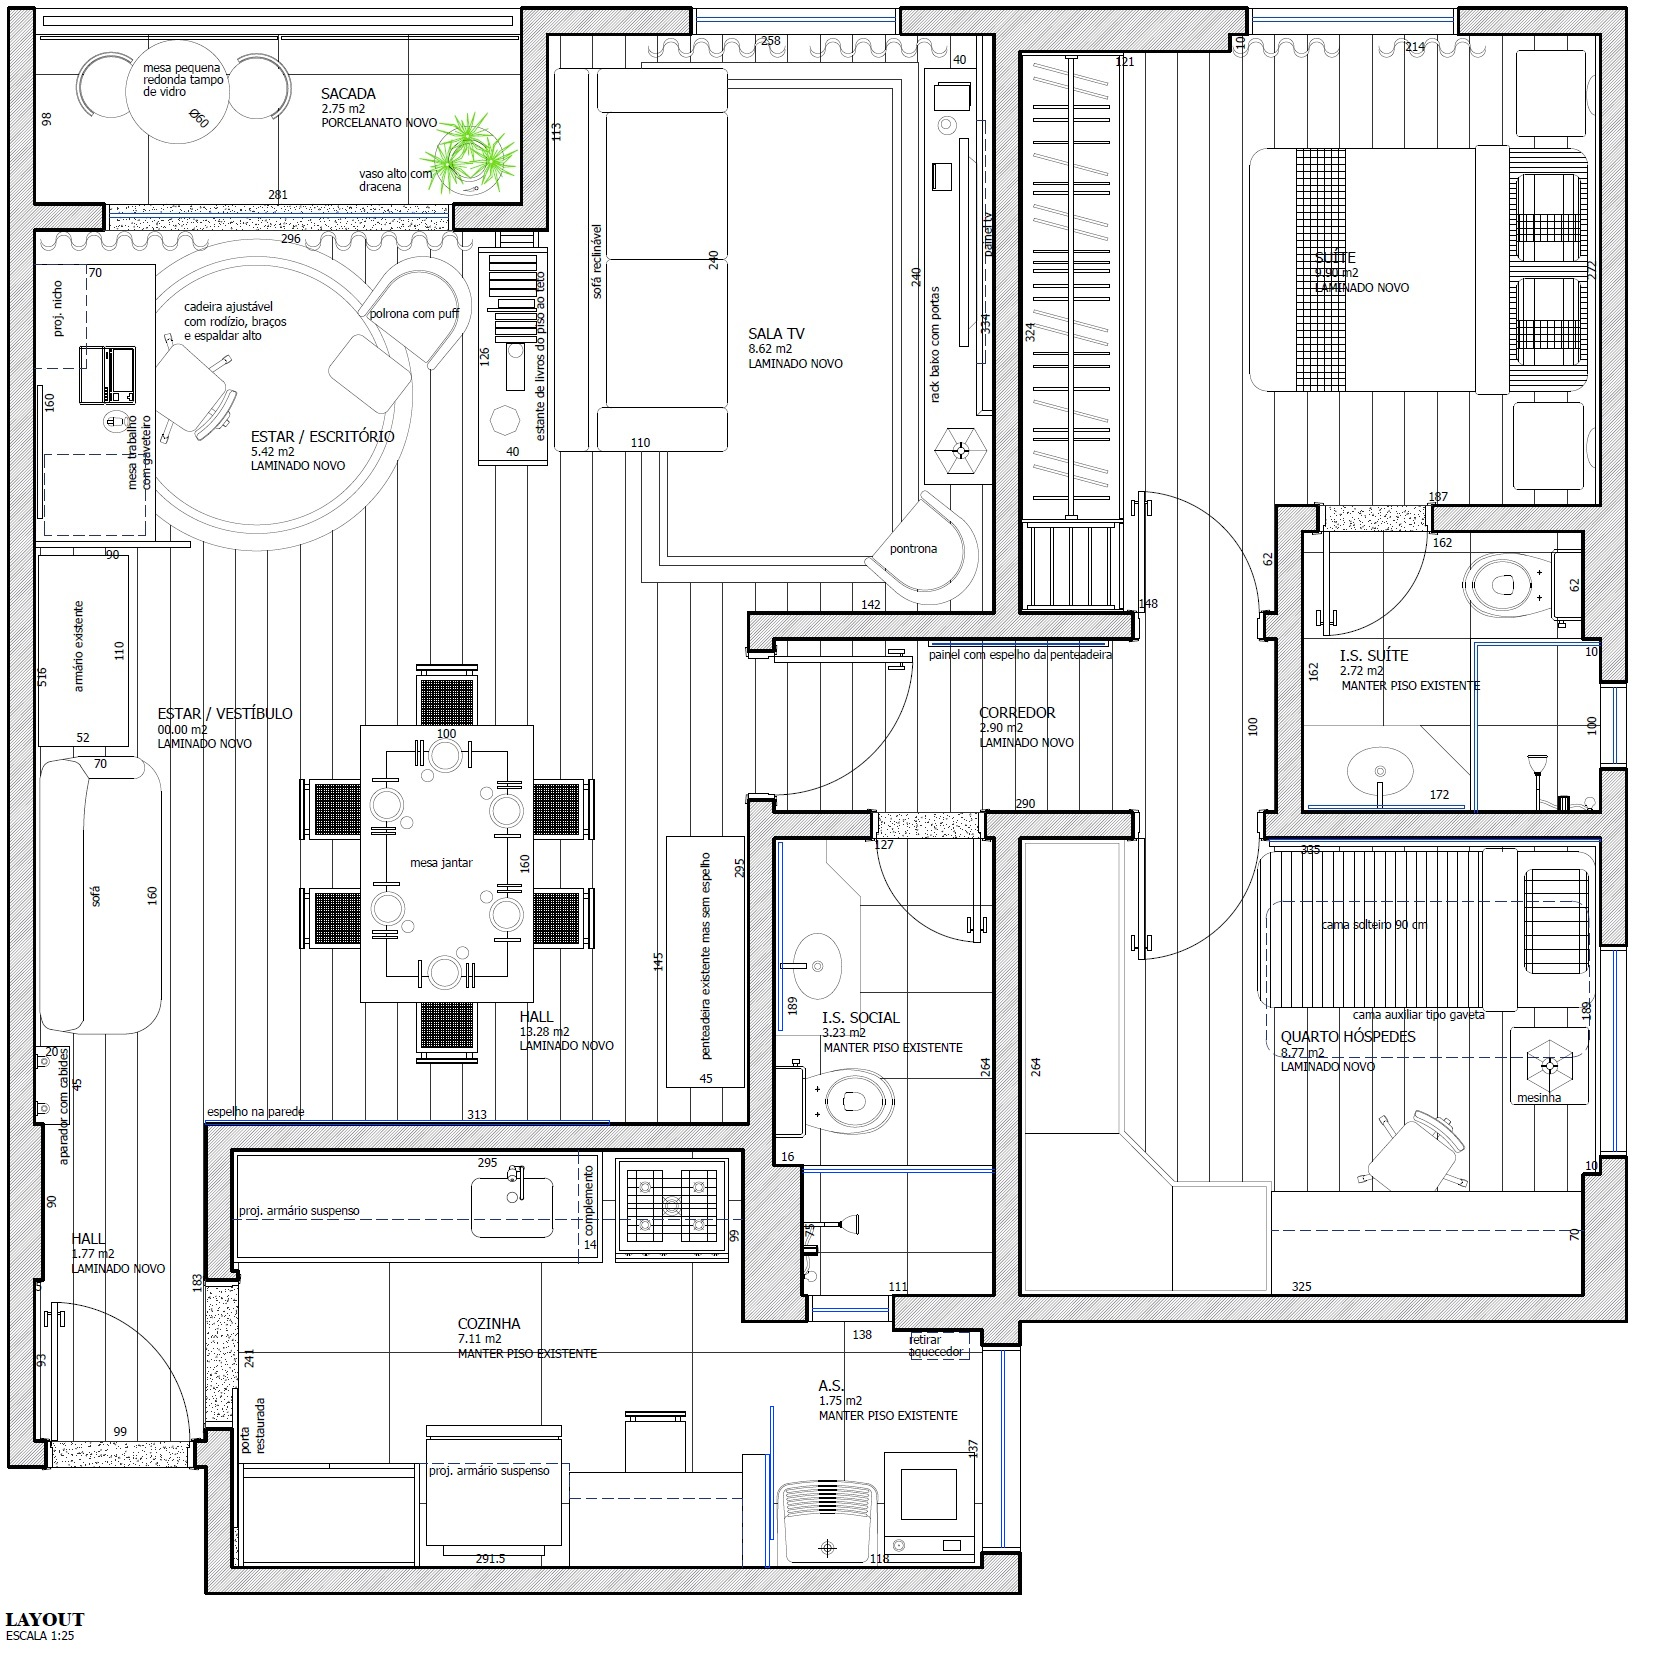 "<p style=""margin-left:0cm; margin-right:0cm""><span style=""font-size:11pt"">Apartamento de 75 m&sup2; com 2 dormit&oacute;rios, 1 su&iacute;te, sala de estar e jantar, cozinha, &aacute;rea de servi&ccedil;o e banheiro social.</span></p>"